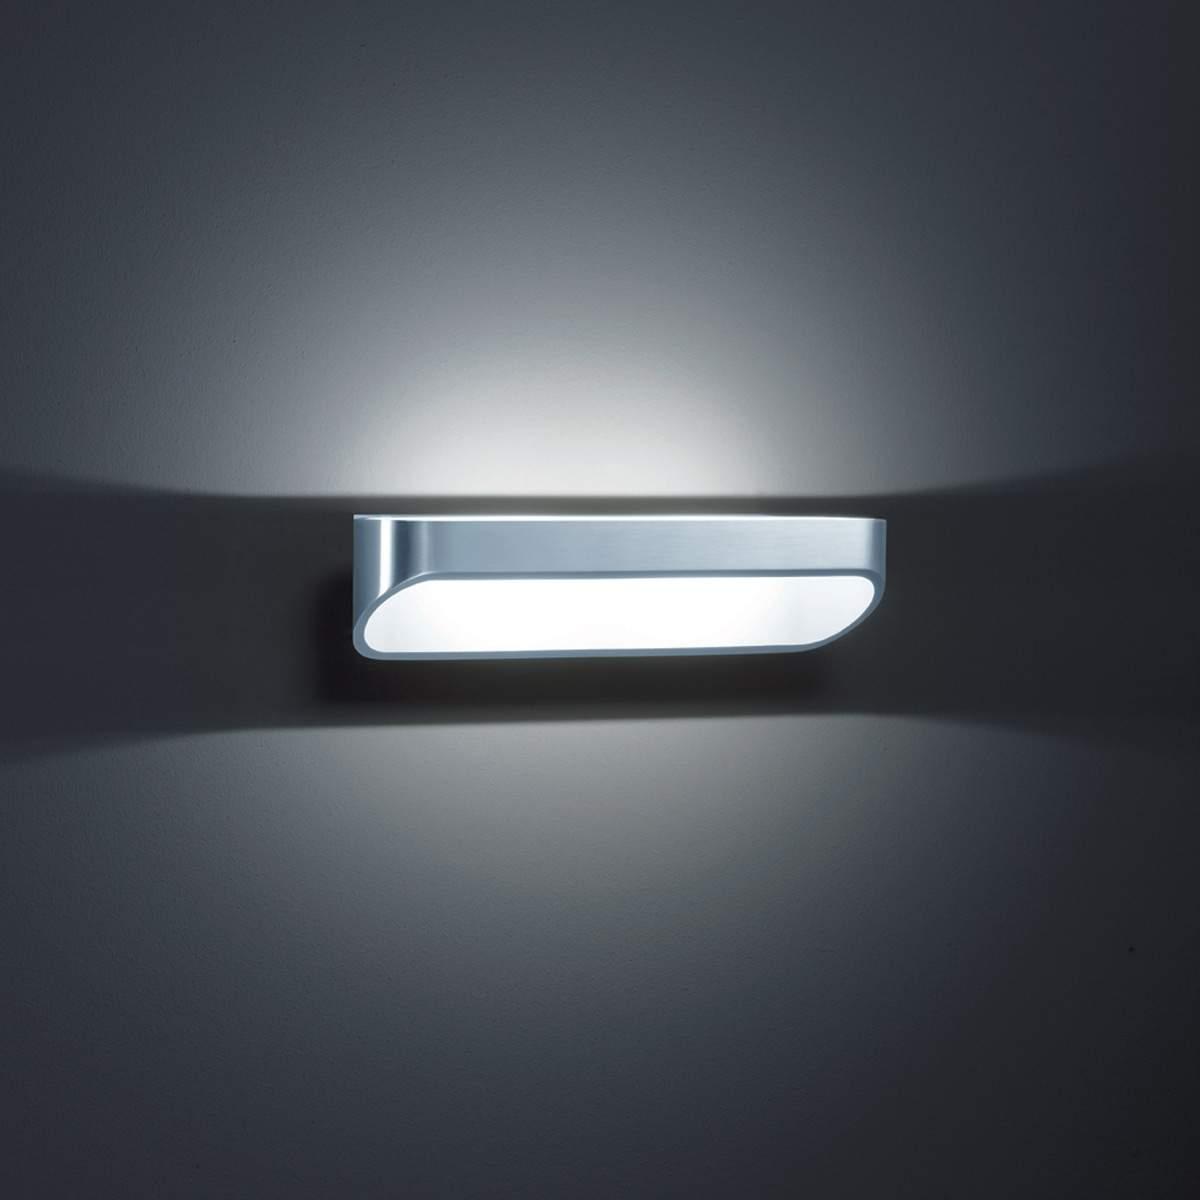 Helestra Onno - LED-Wandleuchte, 30cm, alu poliert